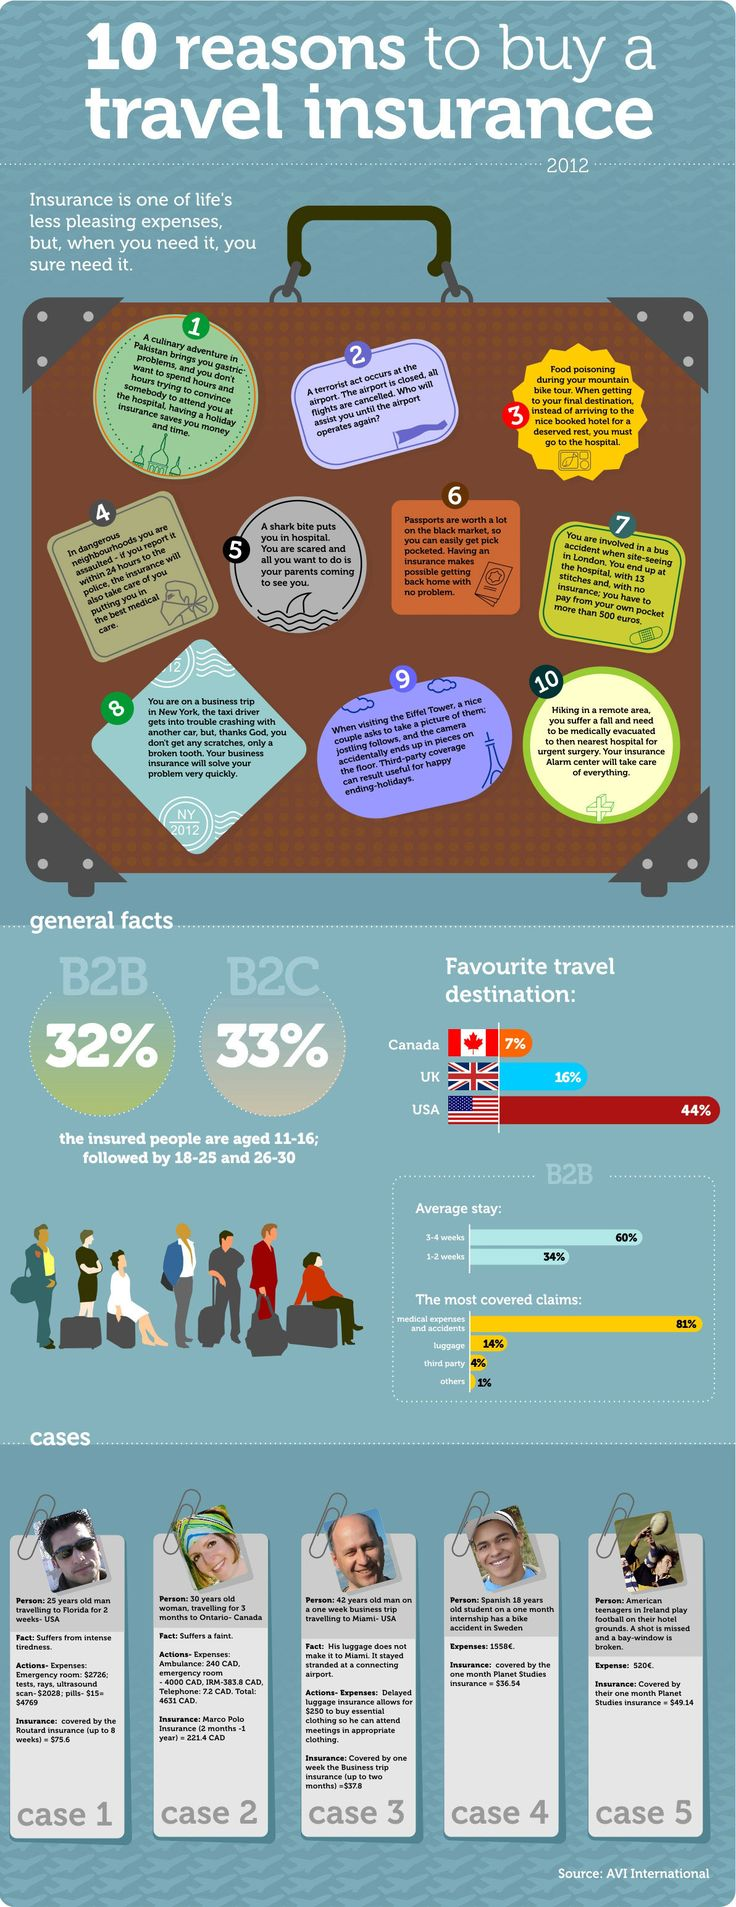 Travelers Insurance Quote | 102 Best Travel Insurance Tips Tricks Images On Pinterest Travel